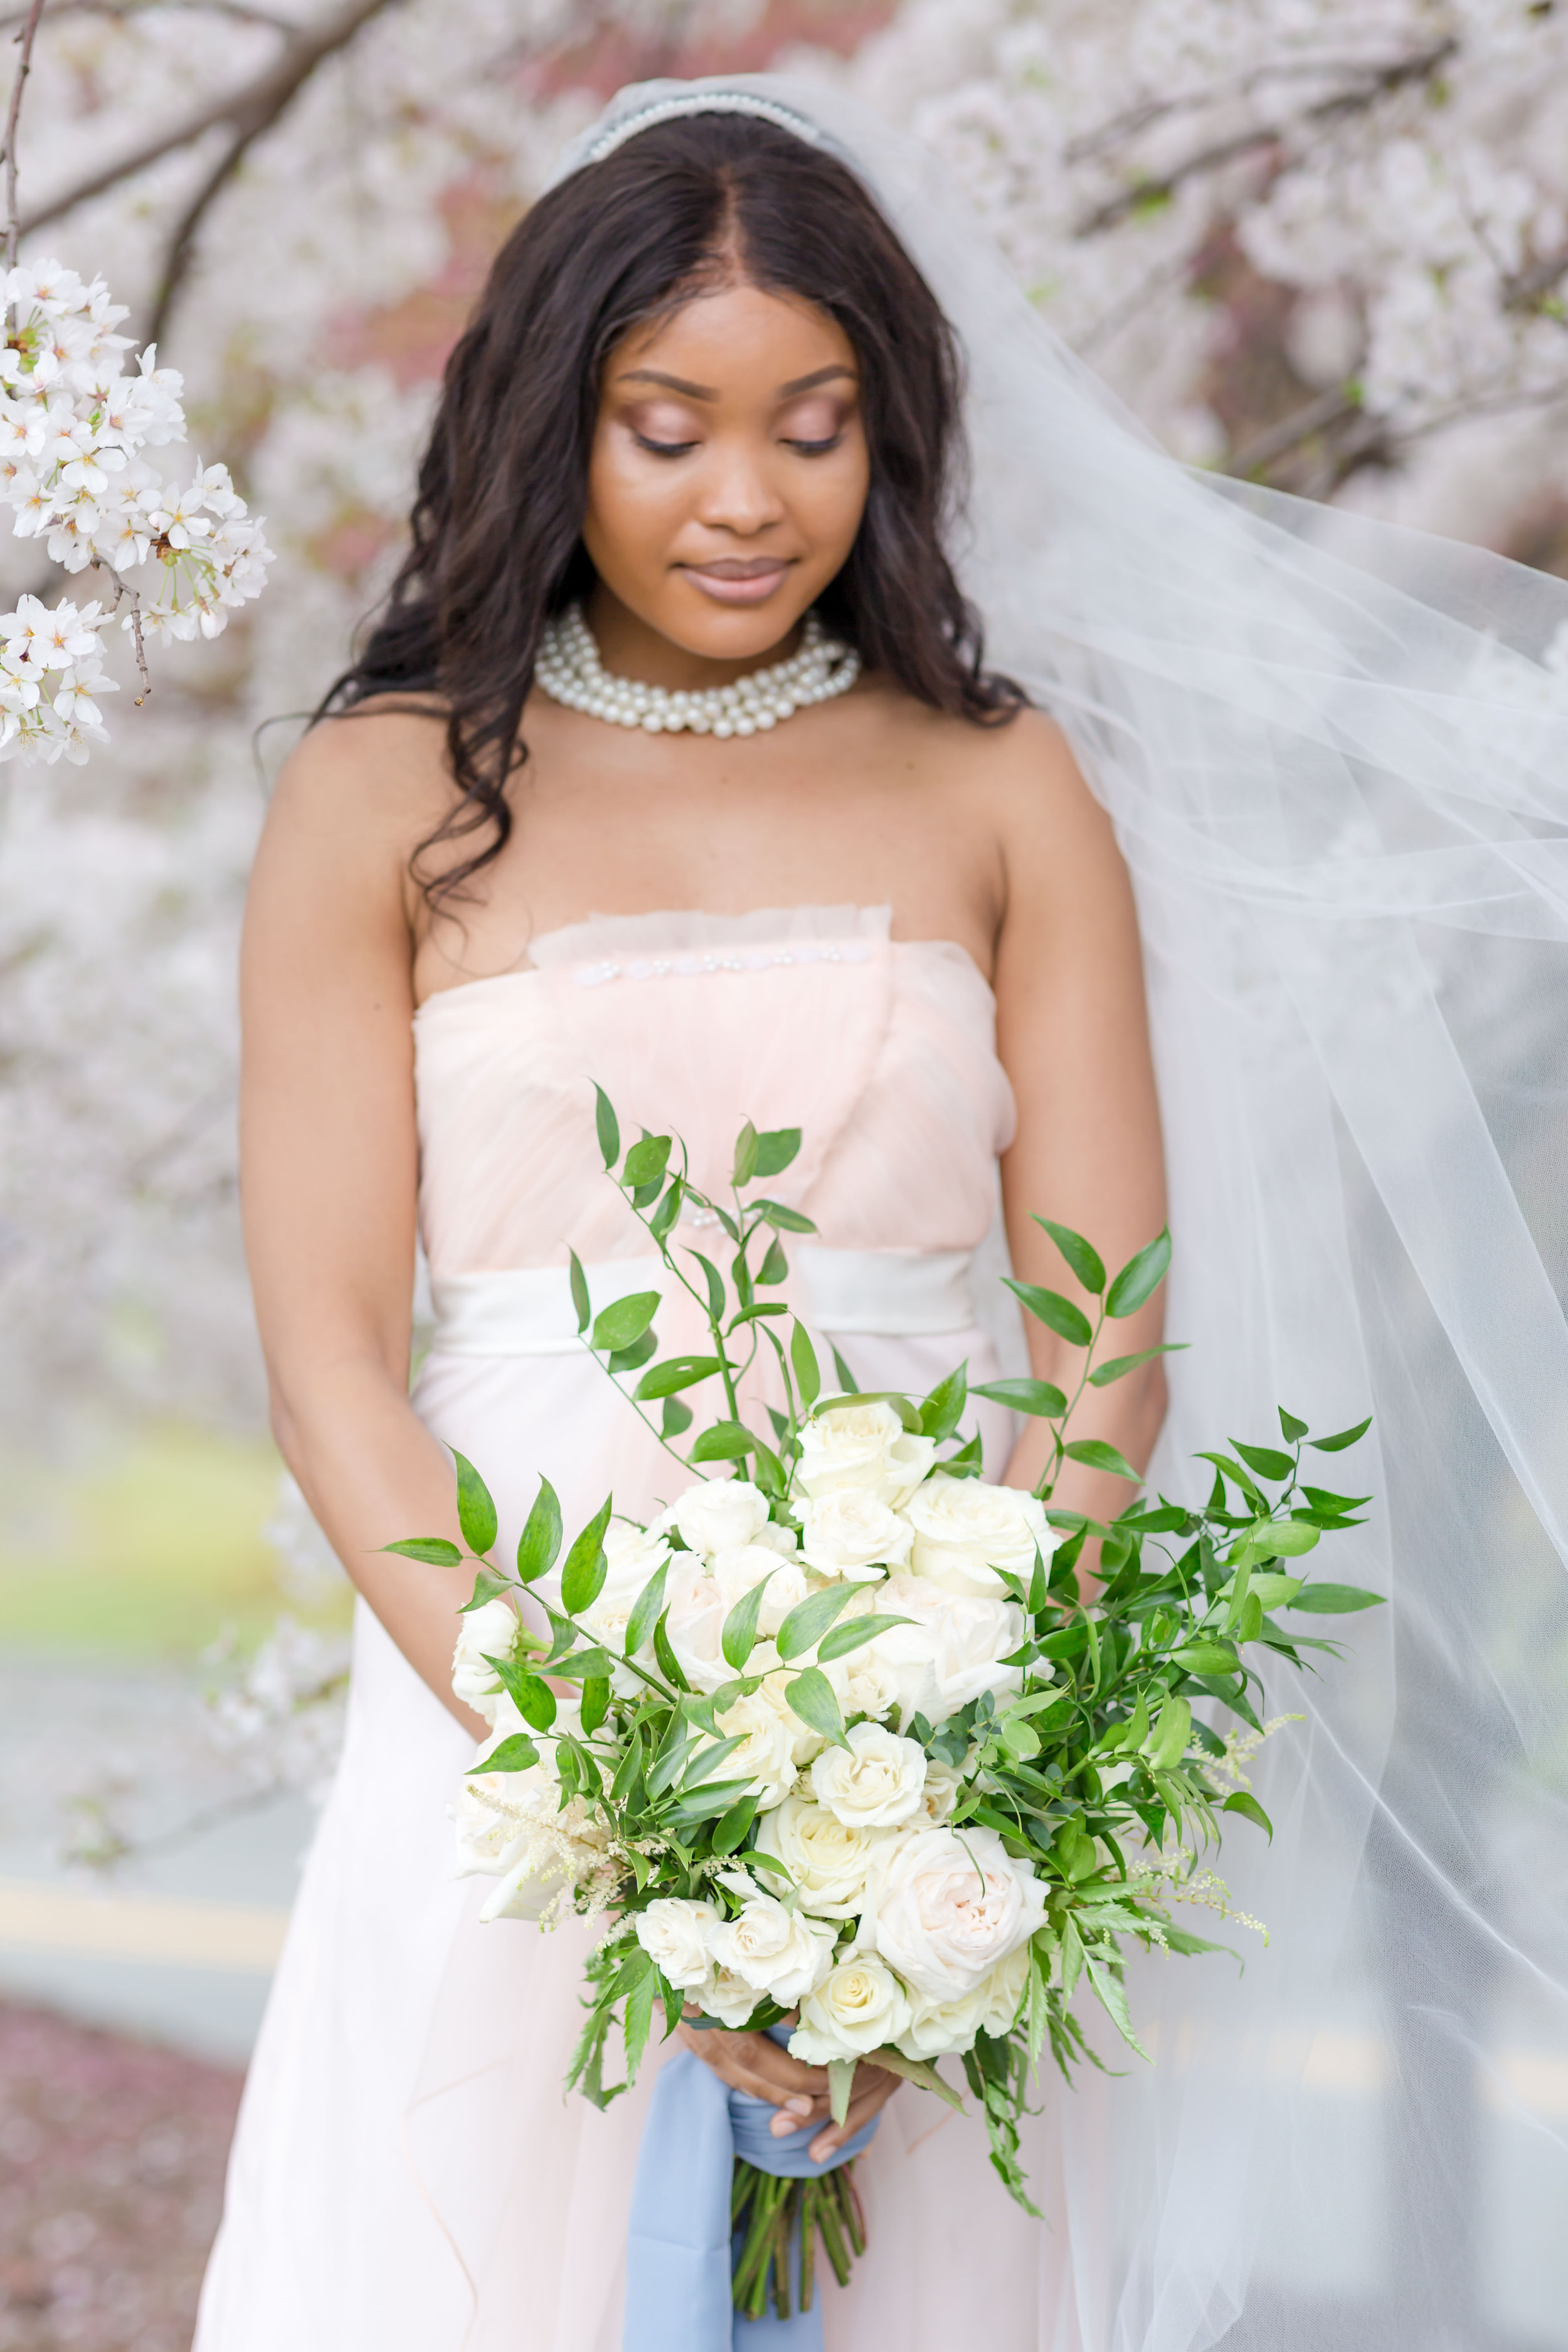 ScarlettExpressions-StyledShoot-Bridal-57.jpg